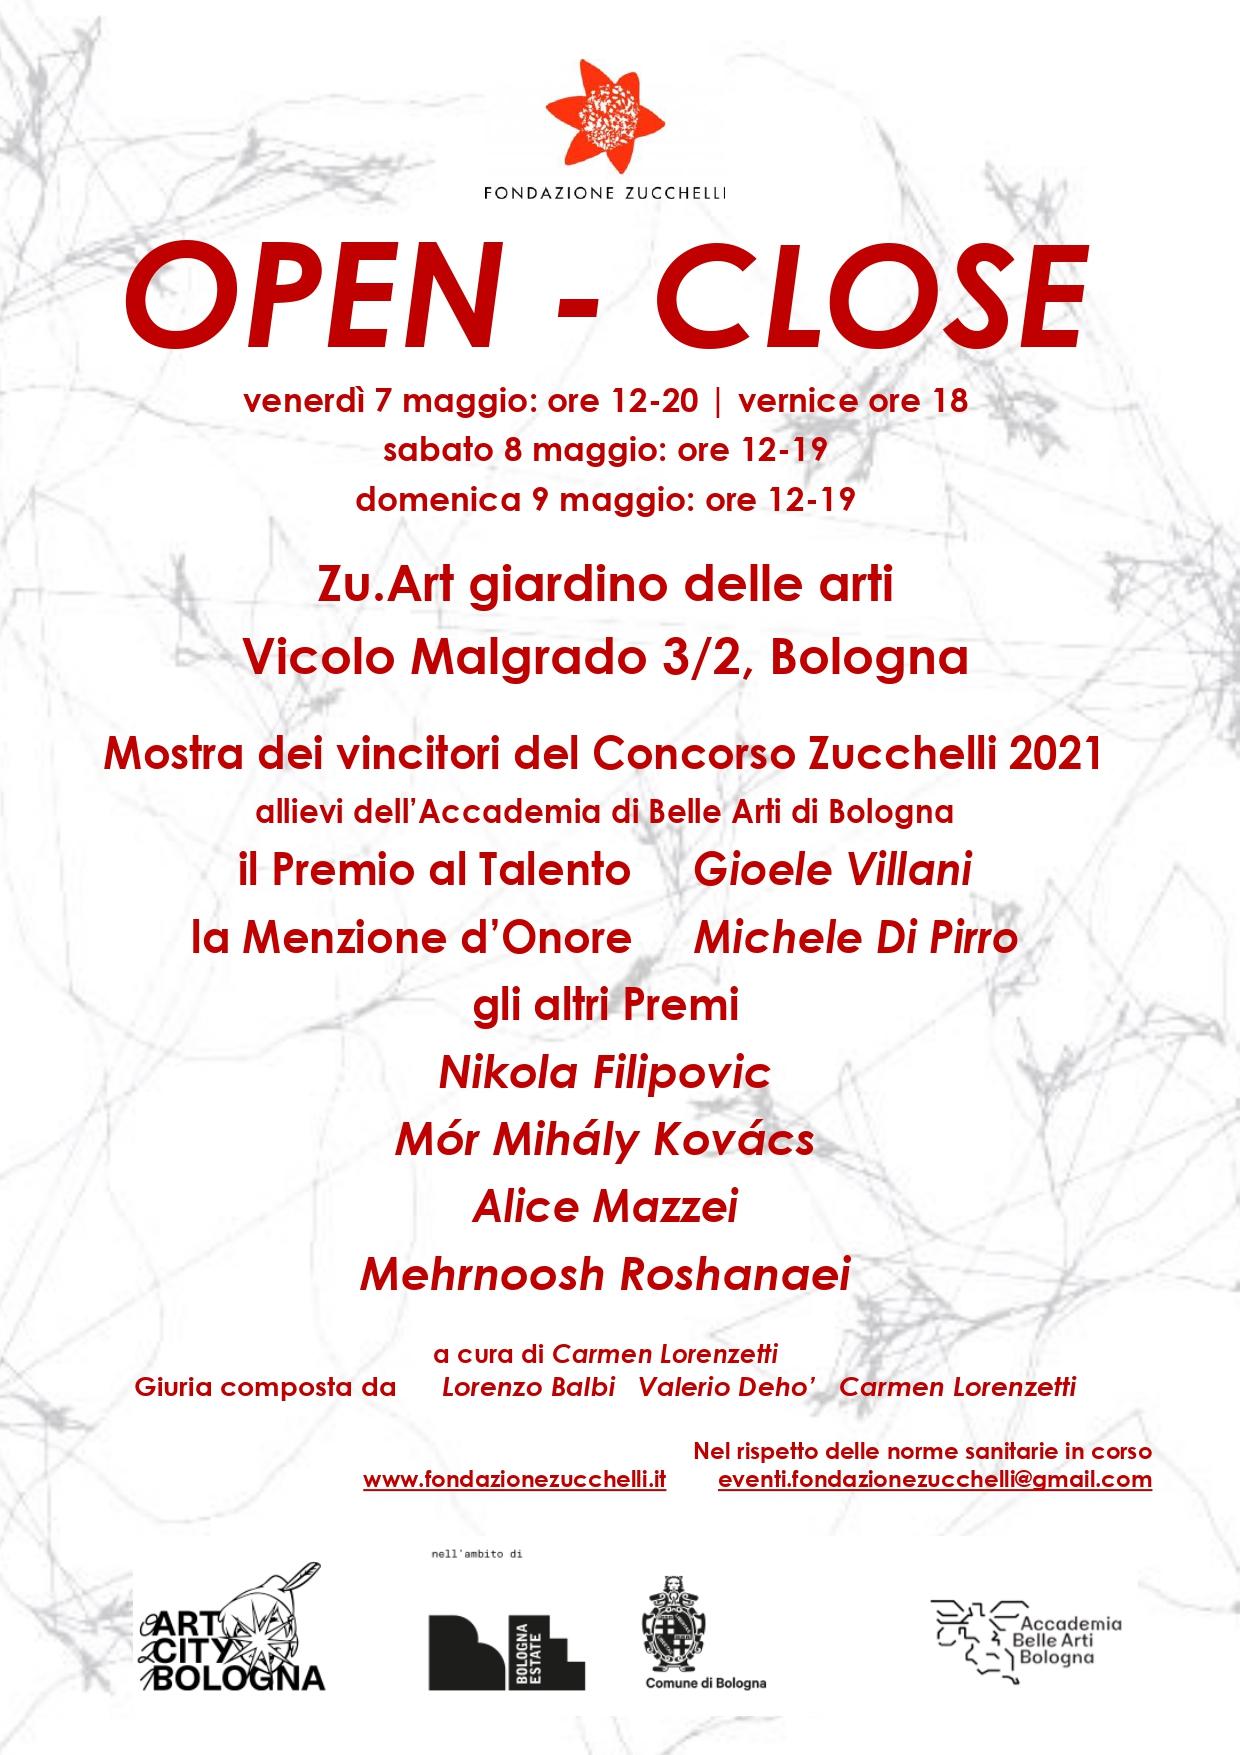 Locandina Mostra Open-Close_Art City Bologna 2021_Zu.Art_page-0001